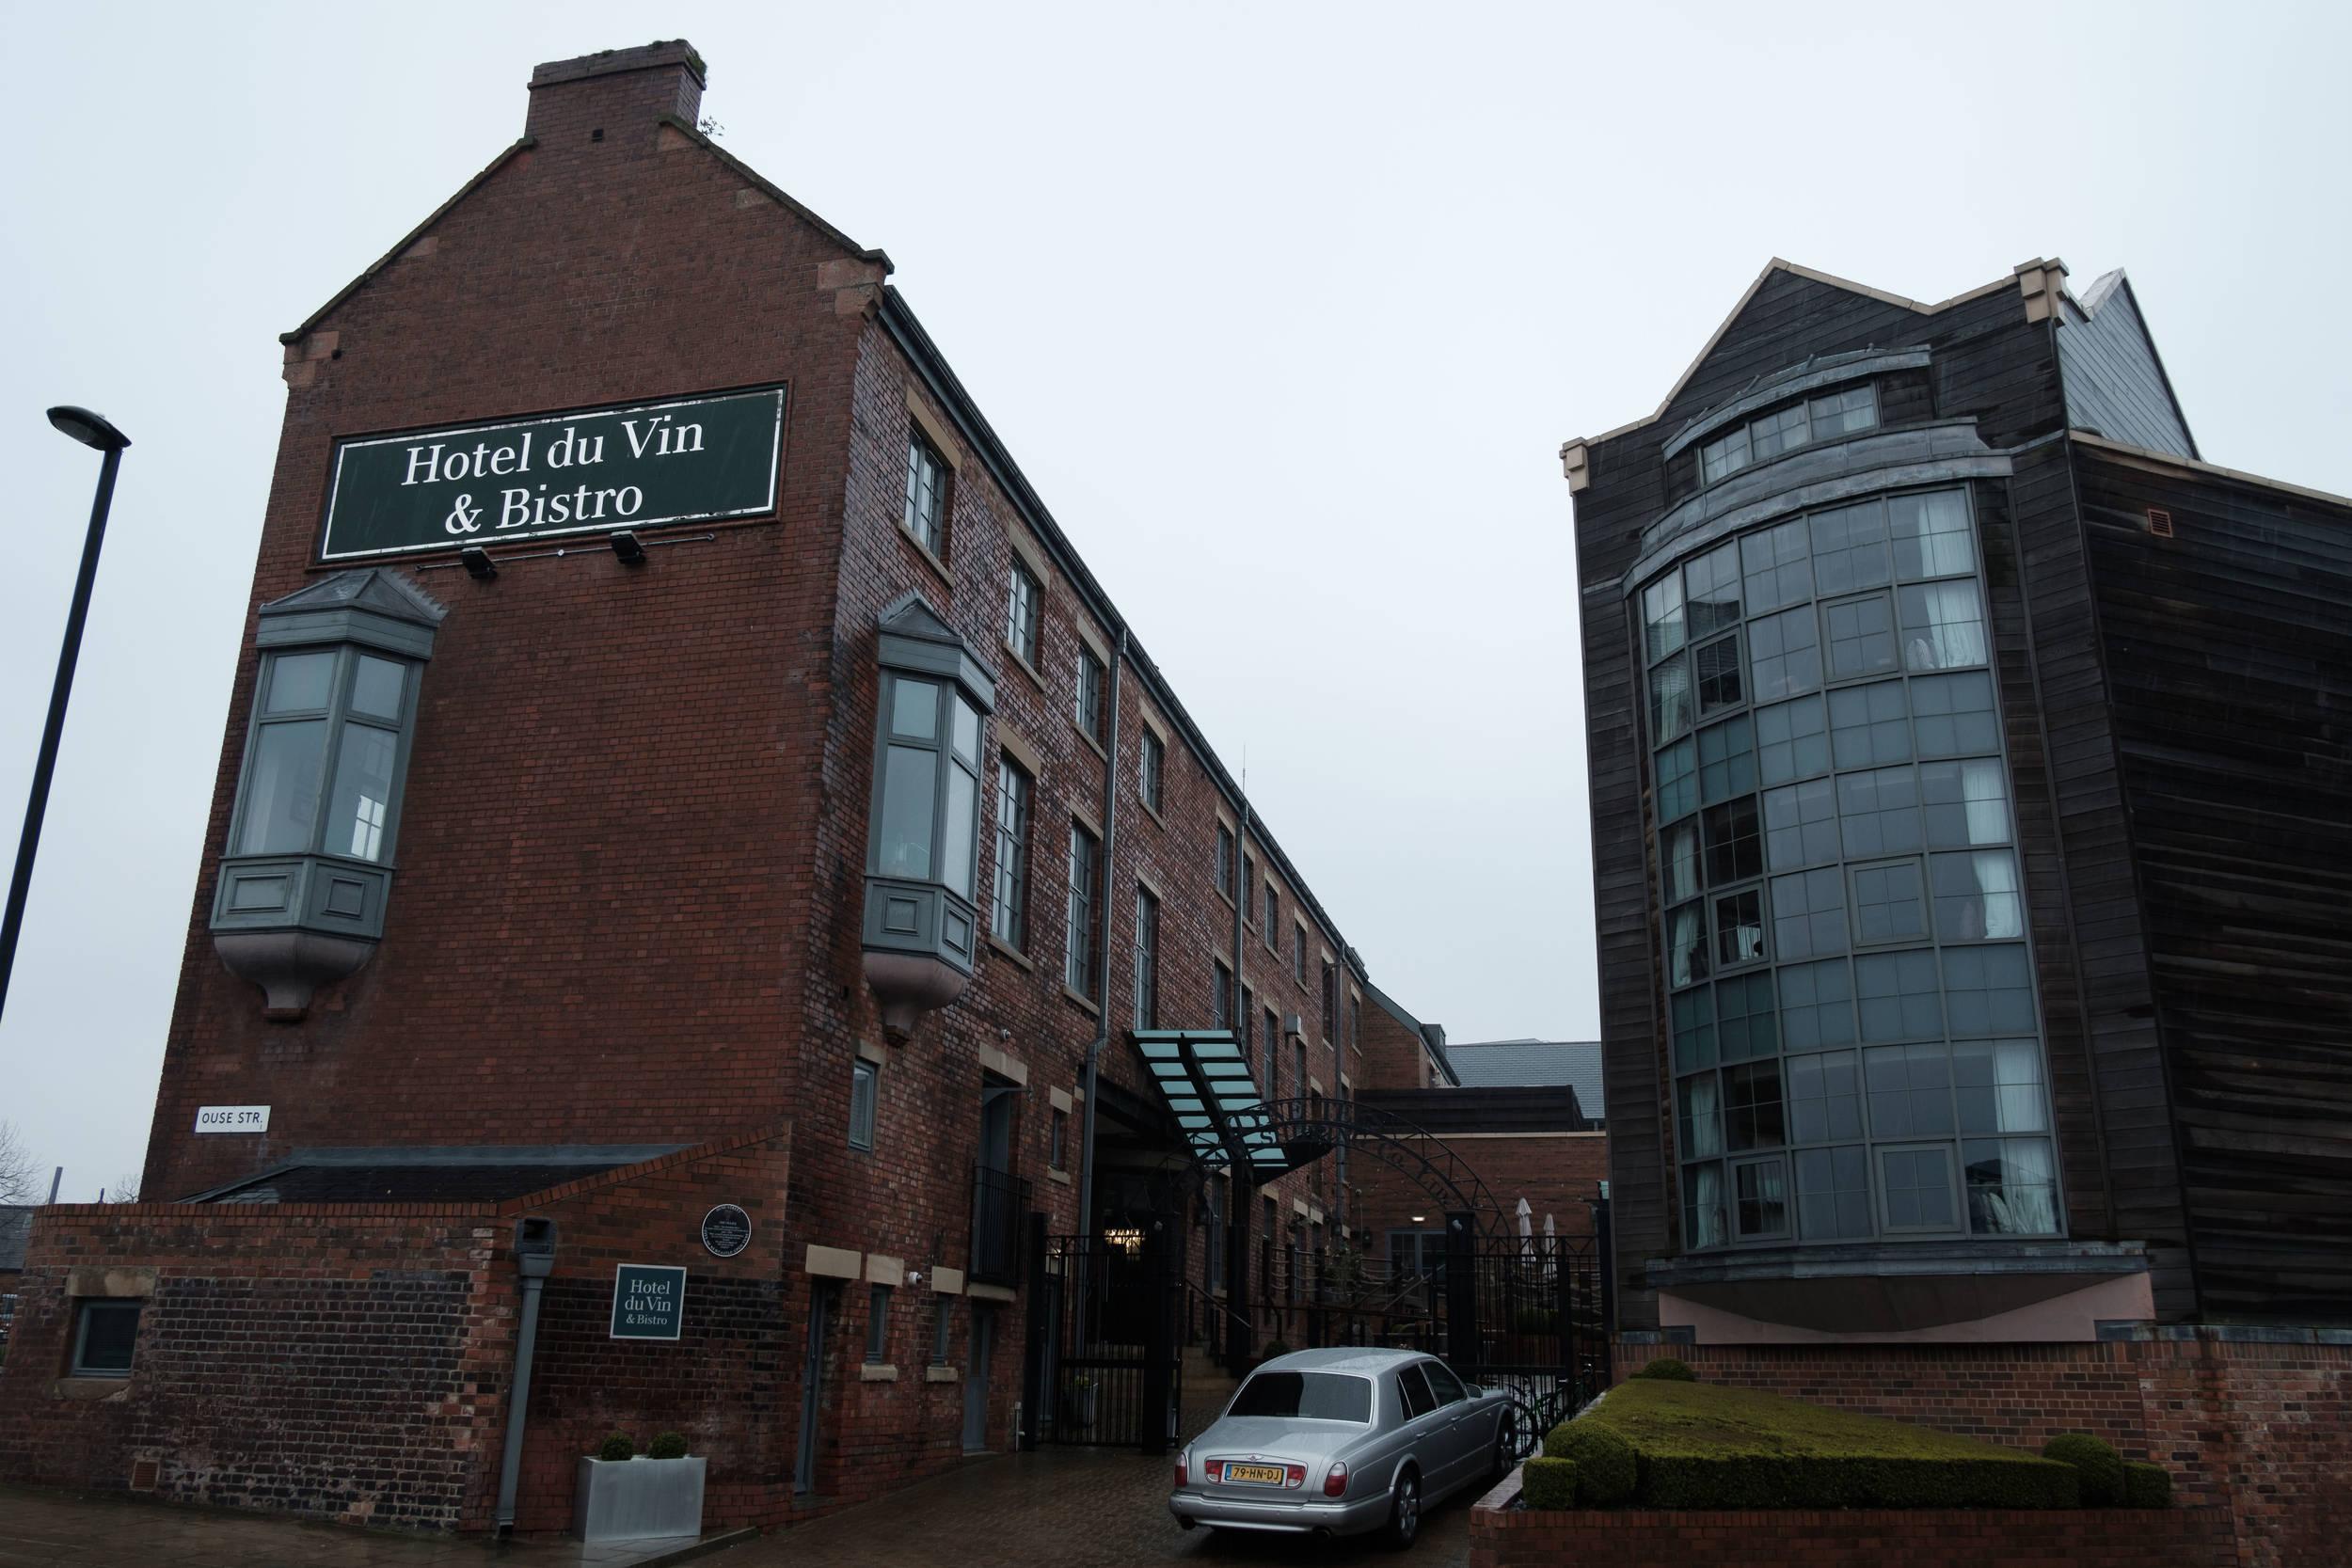 Entrance to Hotel du Vin Newcastle upon Tyne